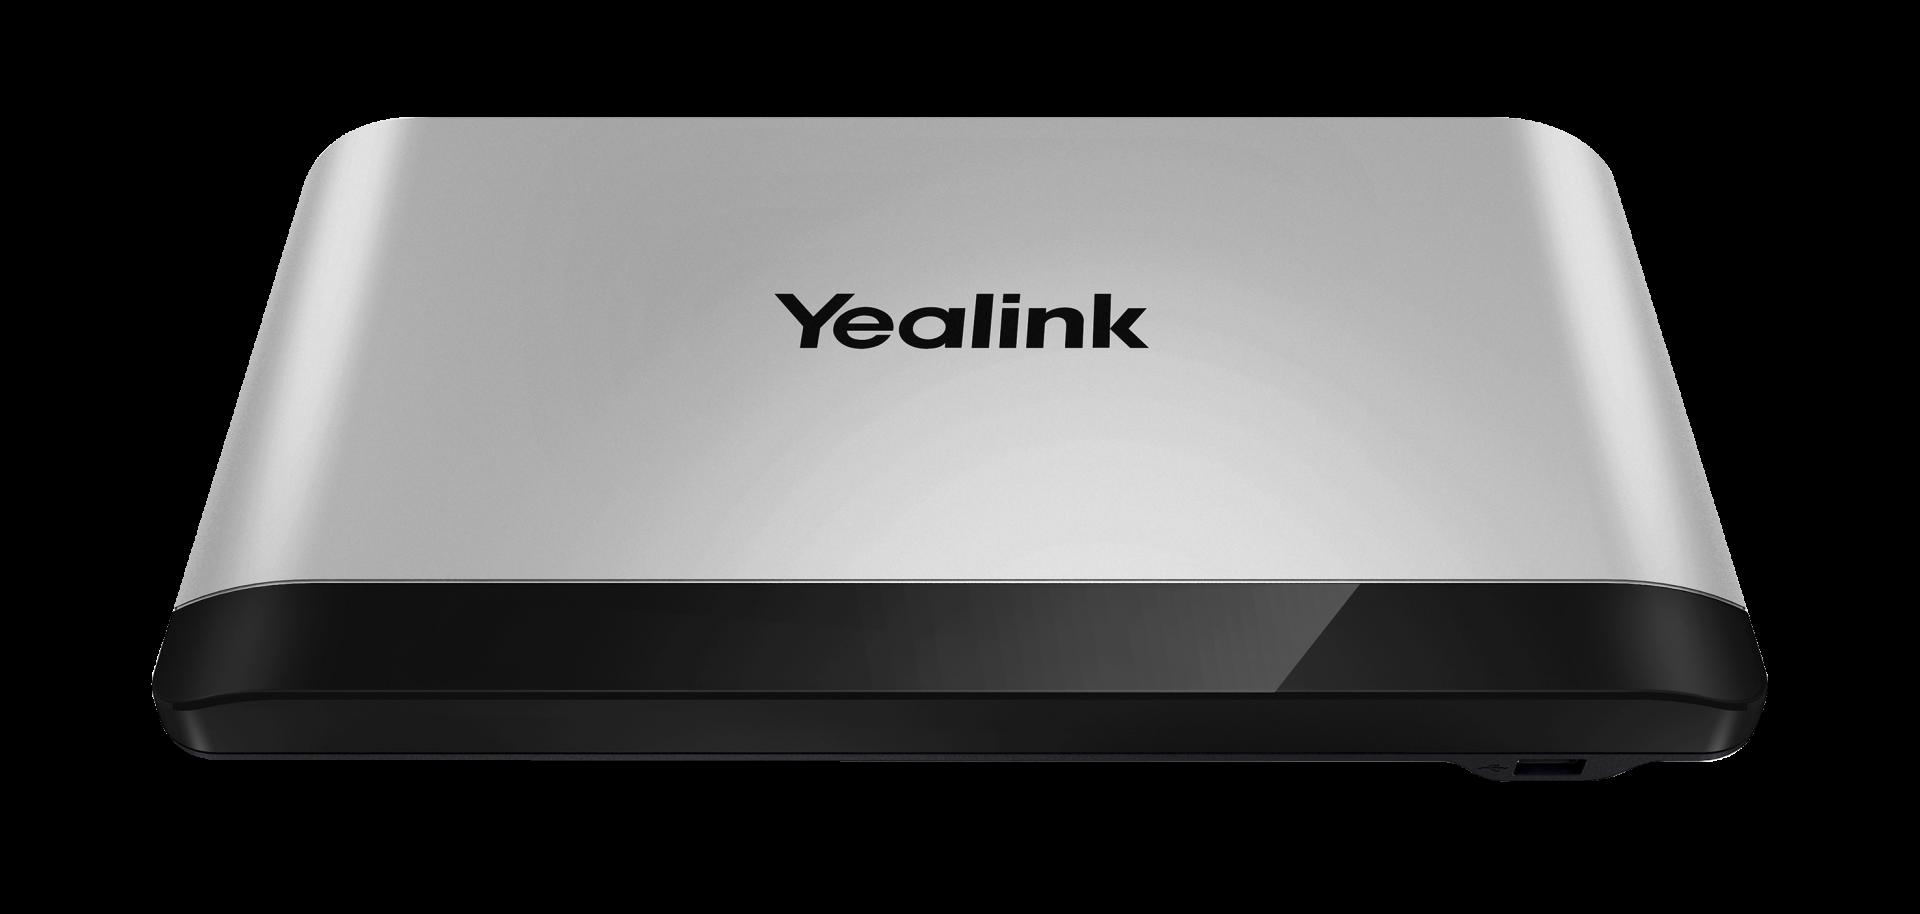 Yealink VC880 Video Konferenzsystem